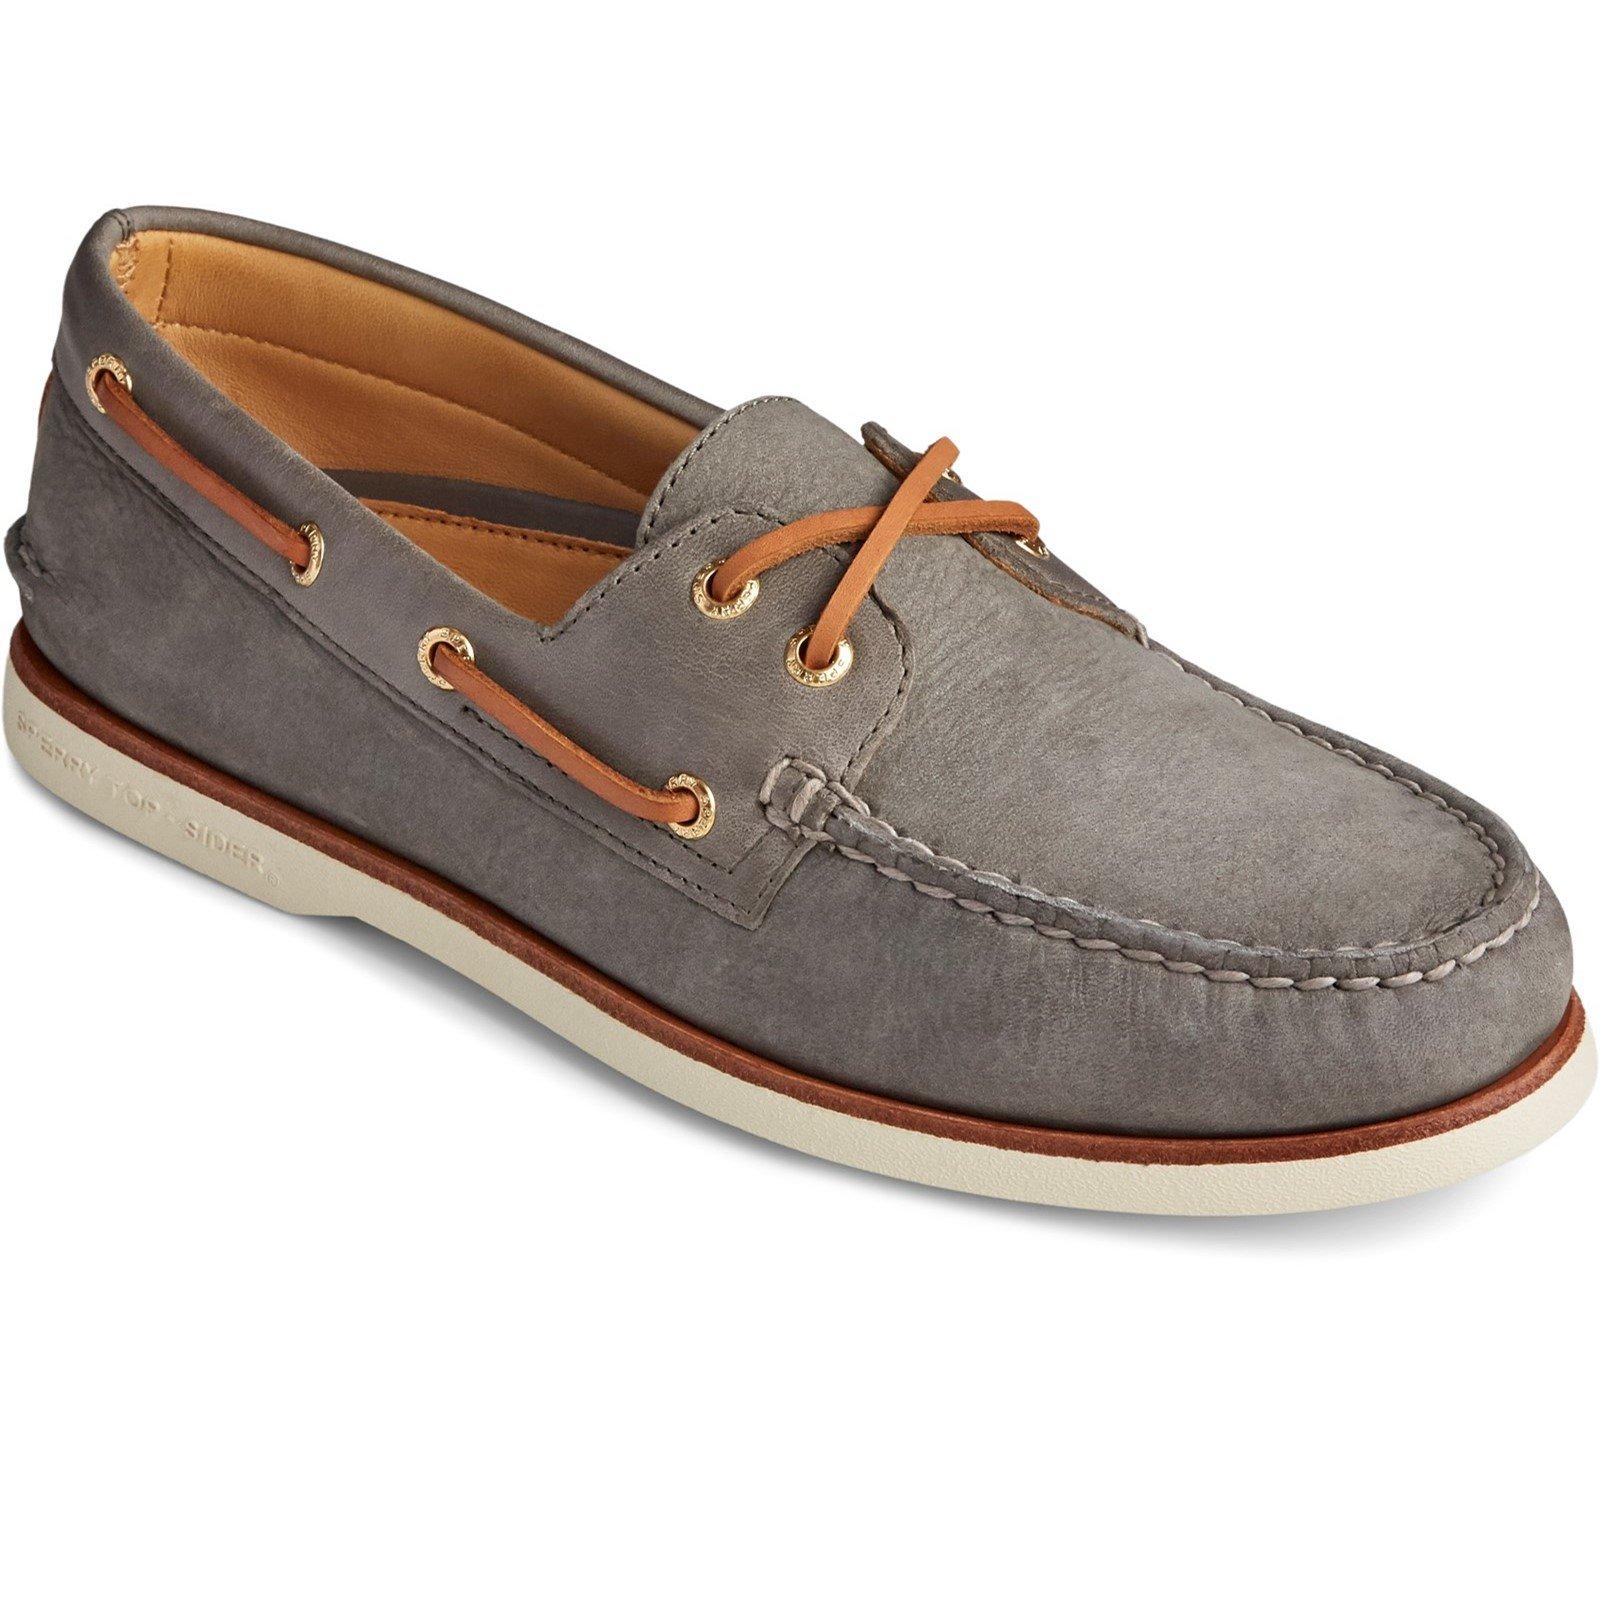 Sperry Men's Authentic Original Seaside Boat Shoe Grey 31529 - Grey 9